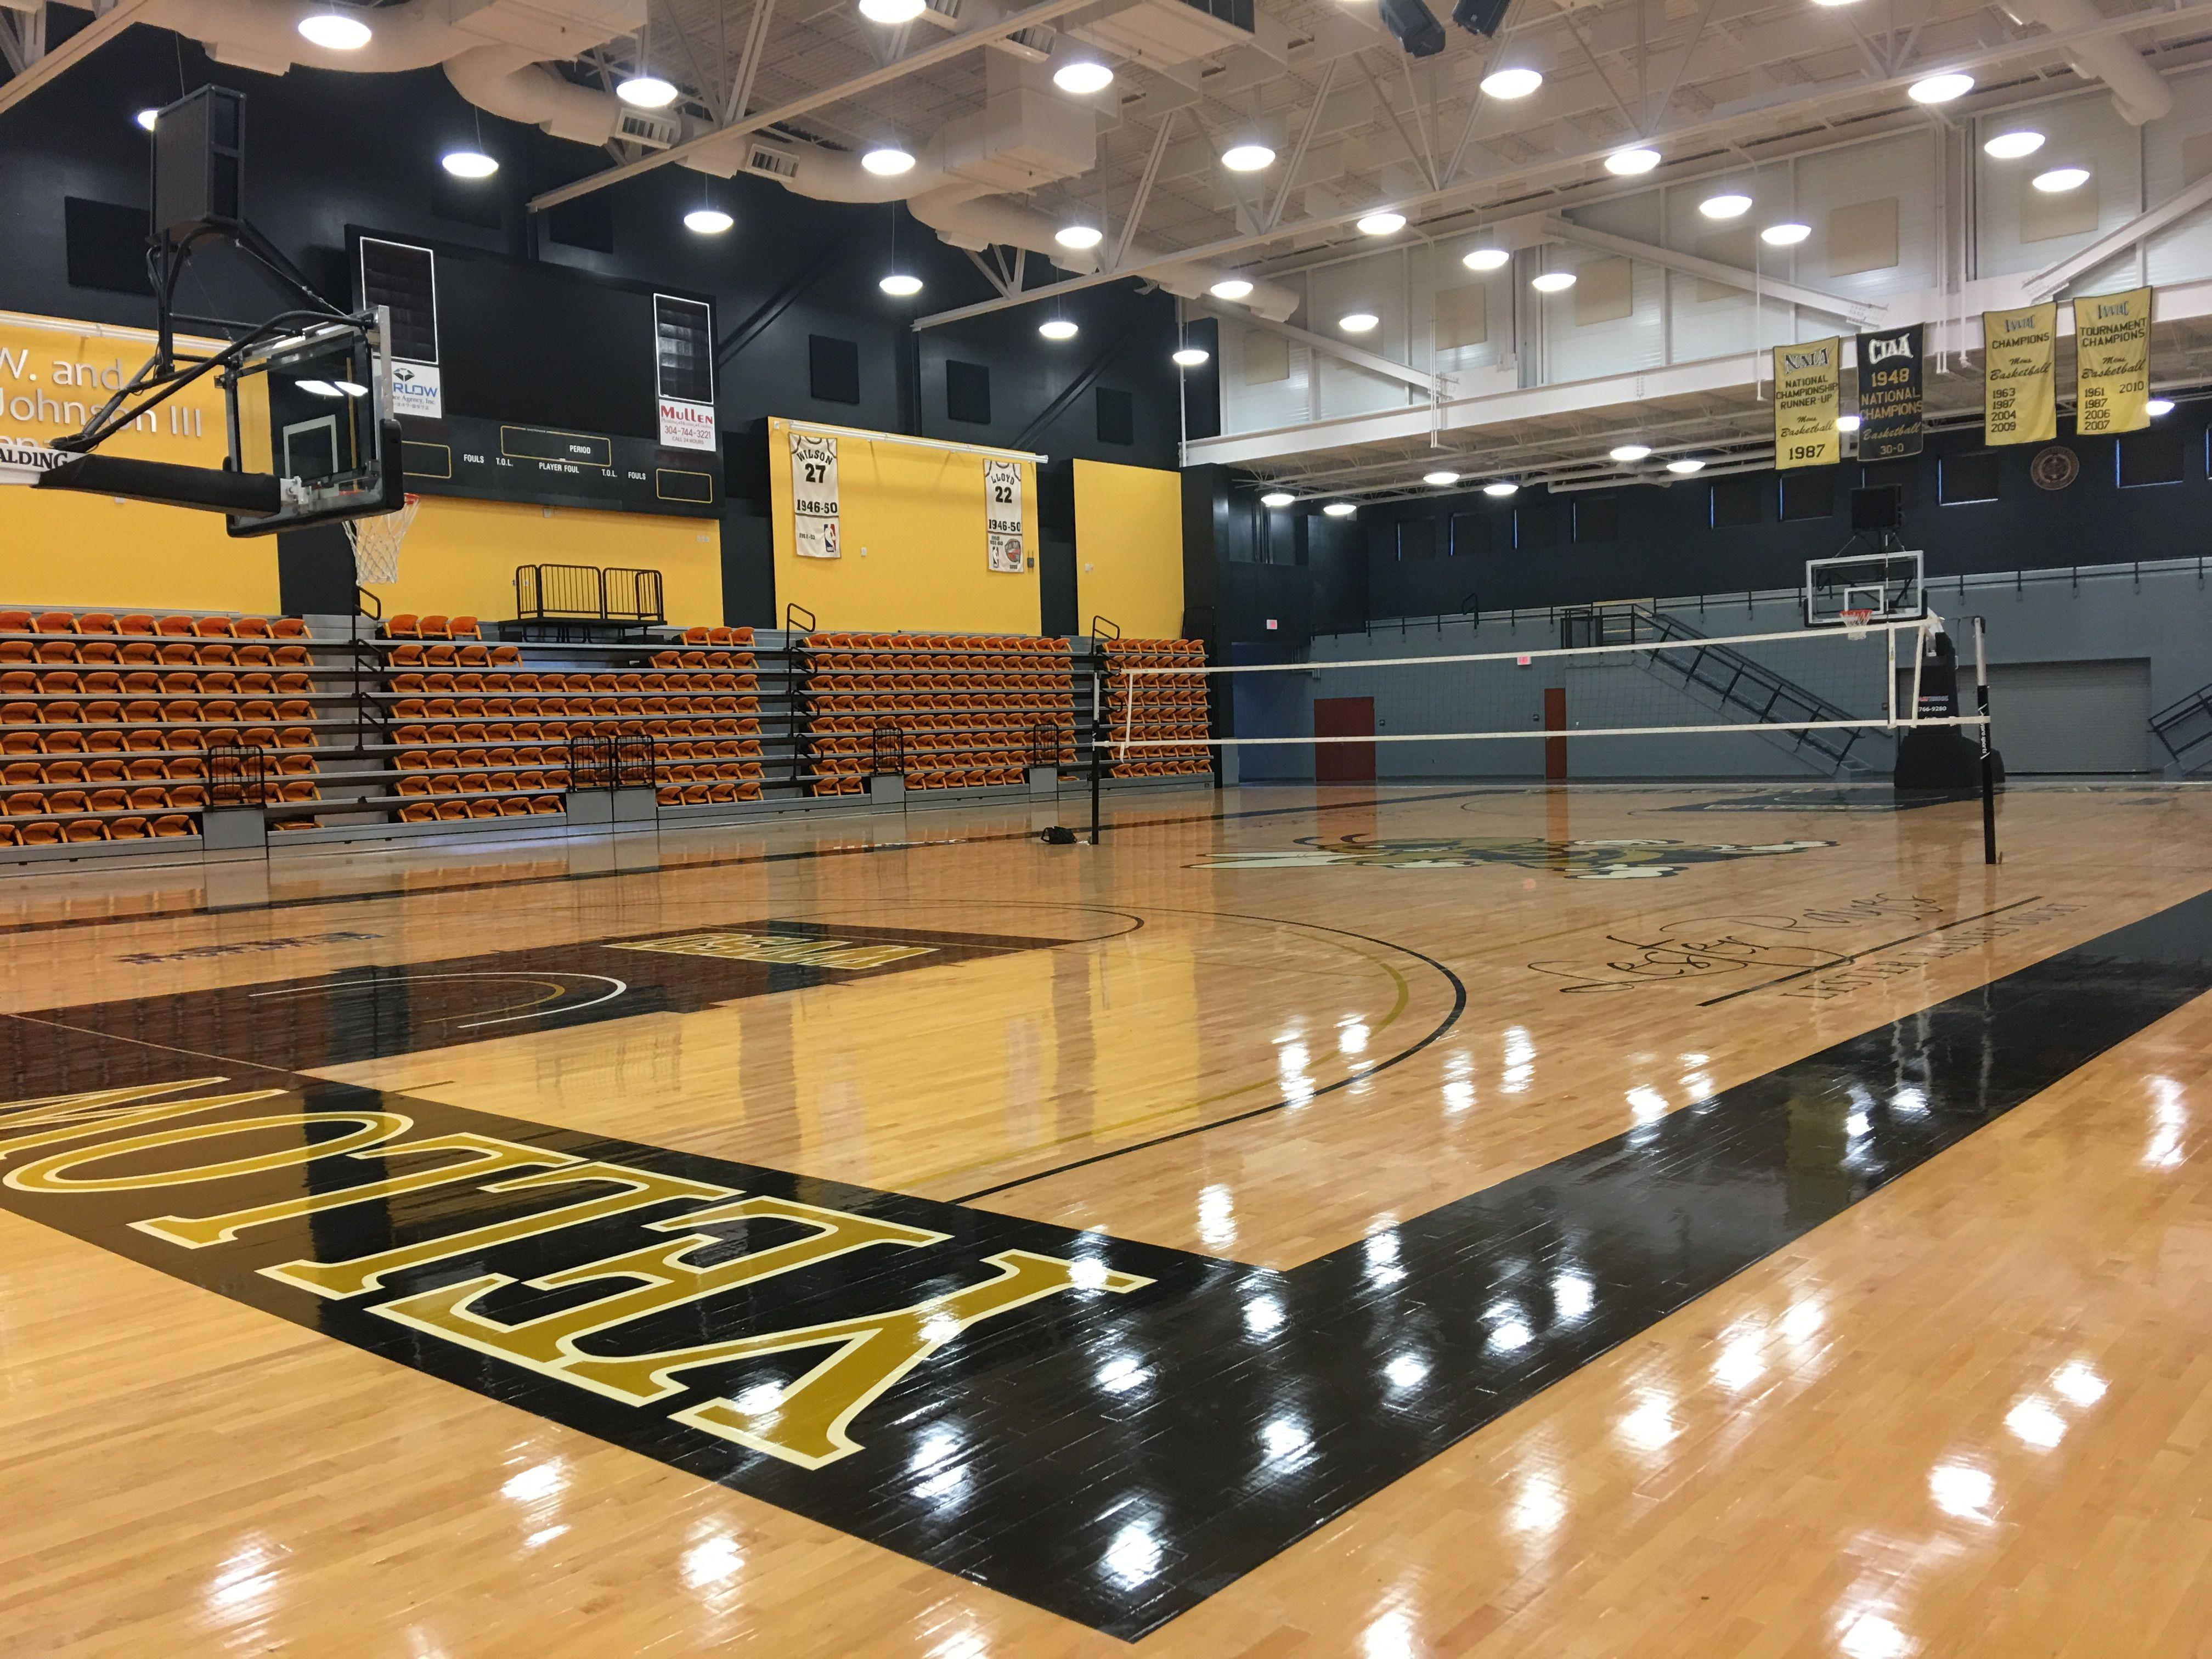 Yellow Jackets Gymnasium Outdoor Volleyball Net Volleyball Net Volleyball Equipment